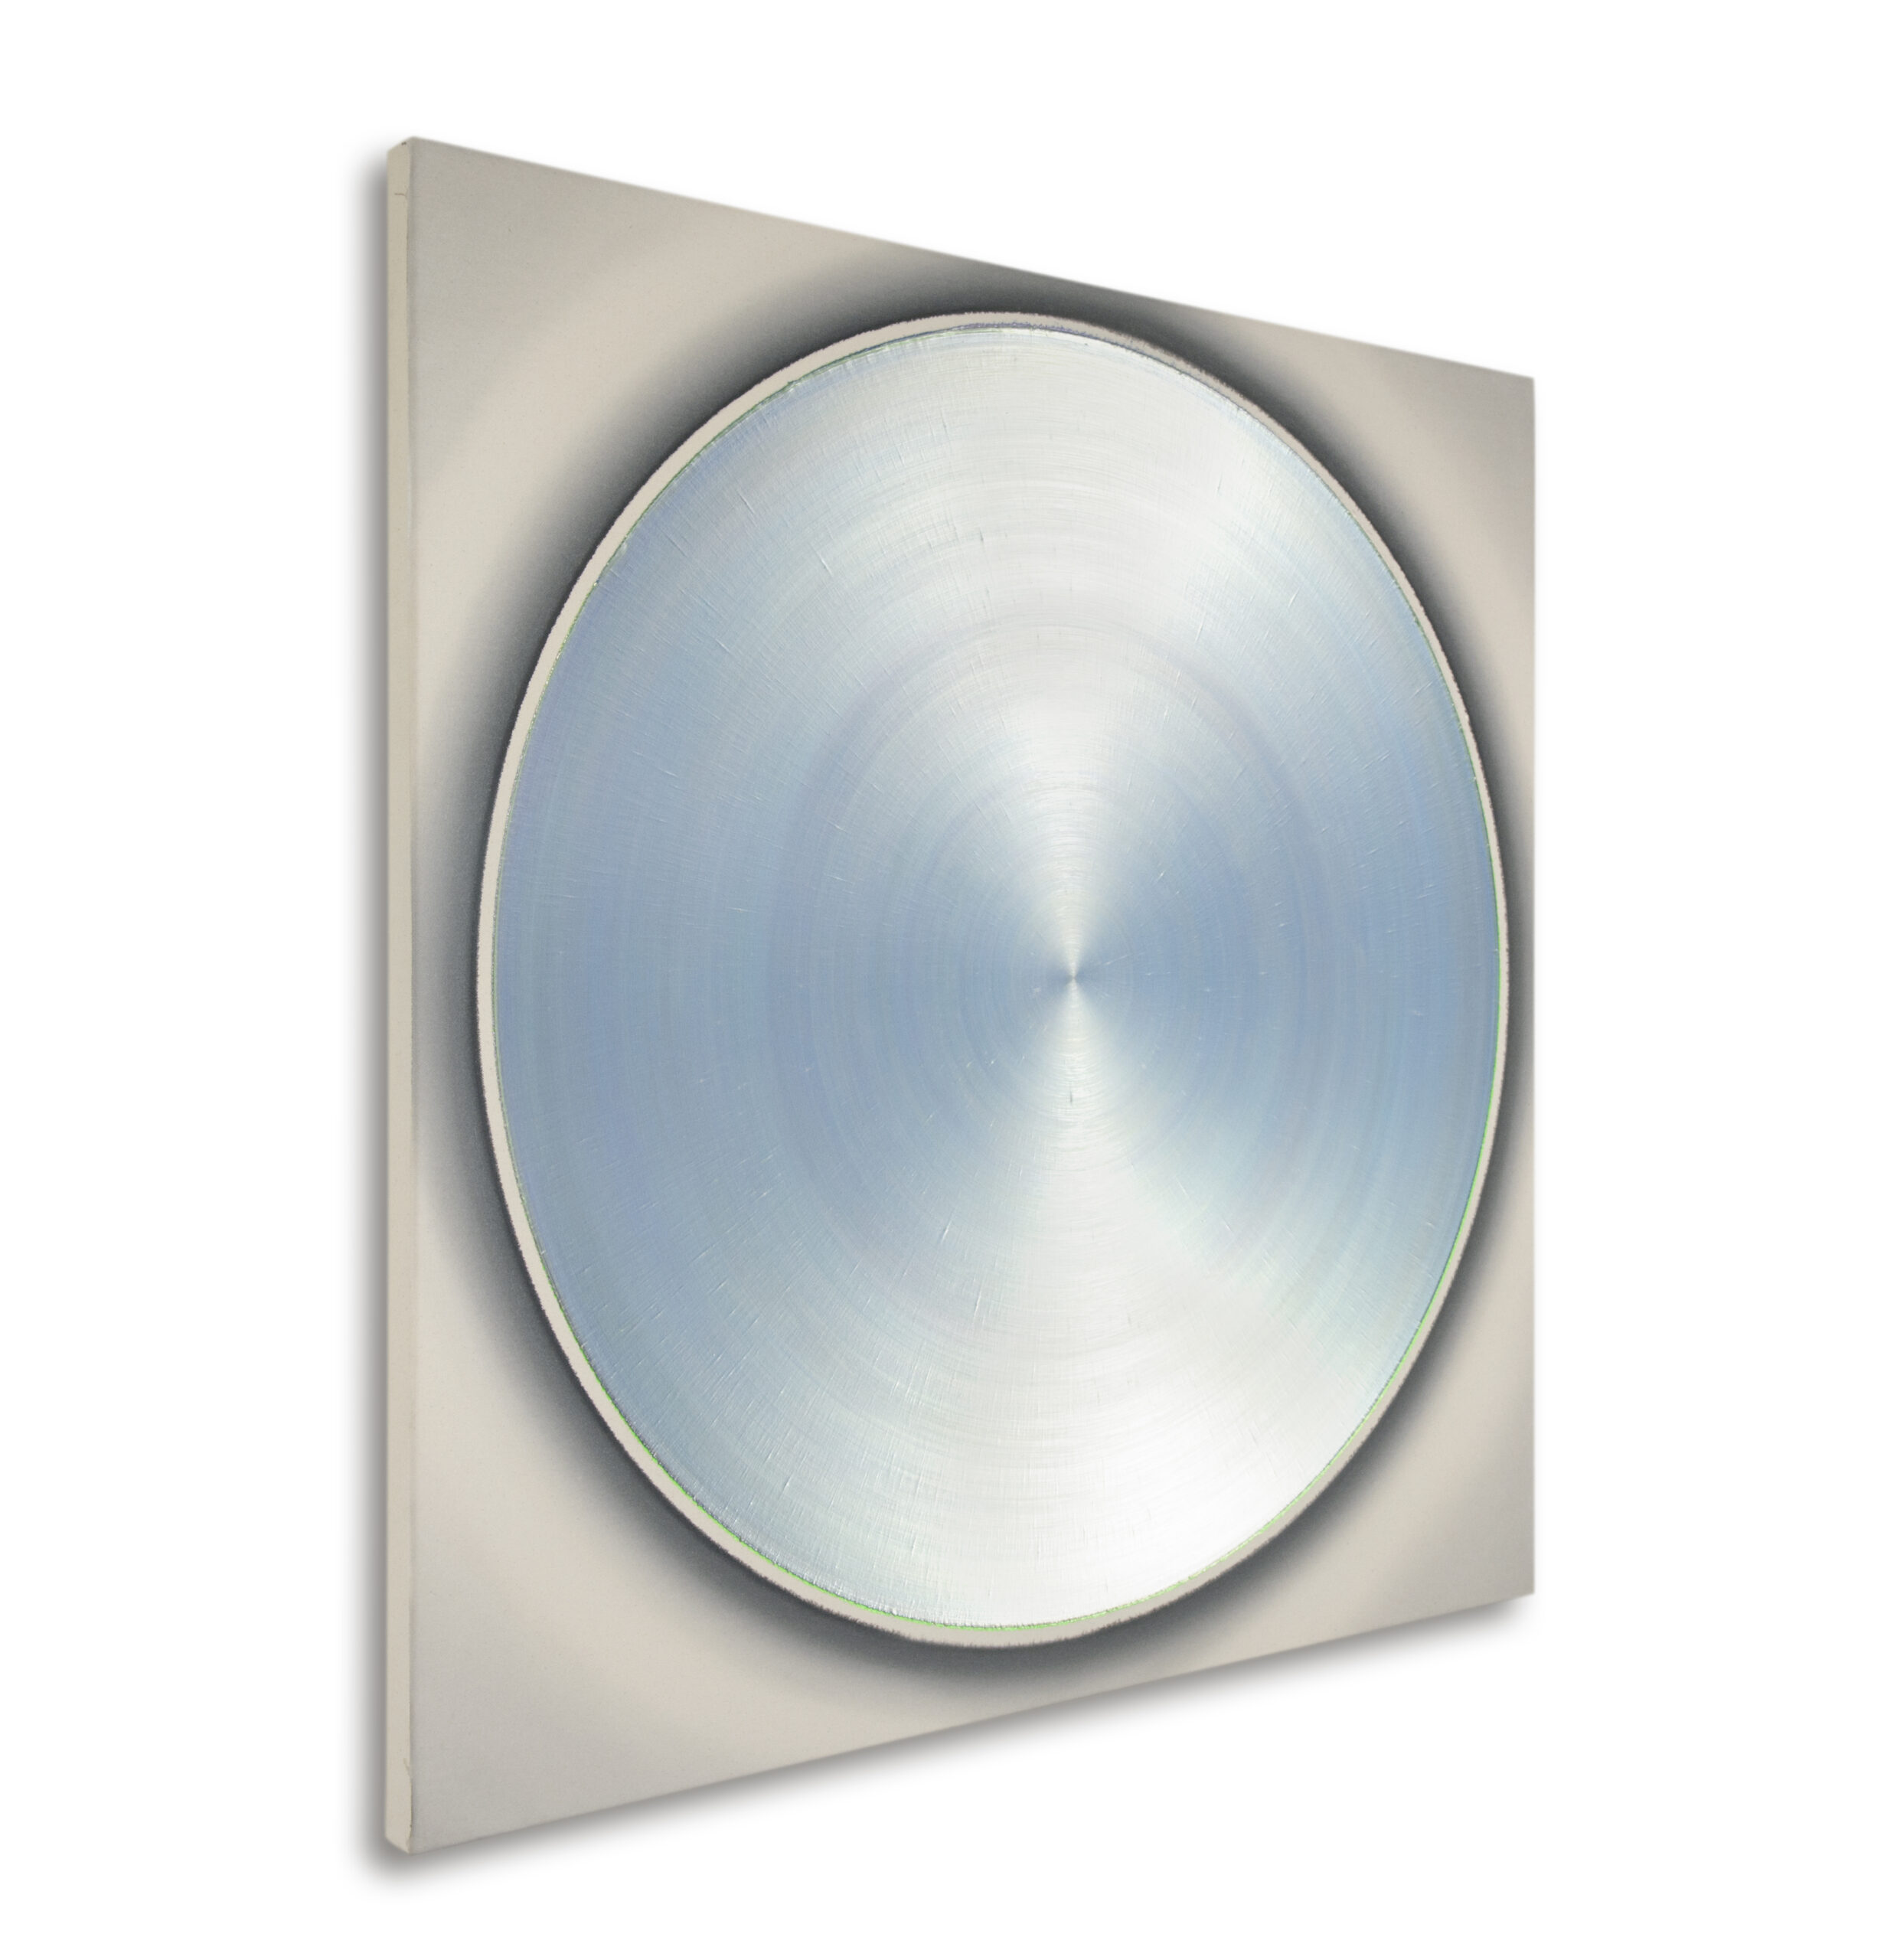 ZF Pale Silver Red Dance With Soft Silver Blue Green, 2011, teilpolarisiert, Acryl auf Leinwand, 130 x 130 cm, links